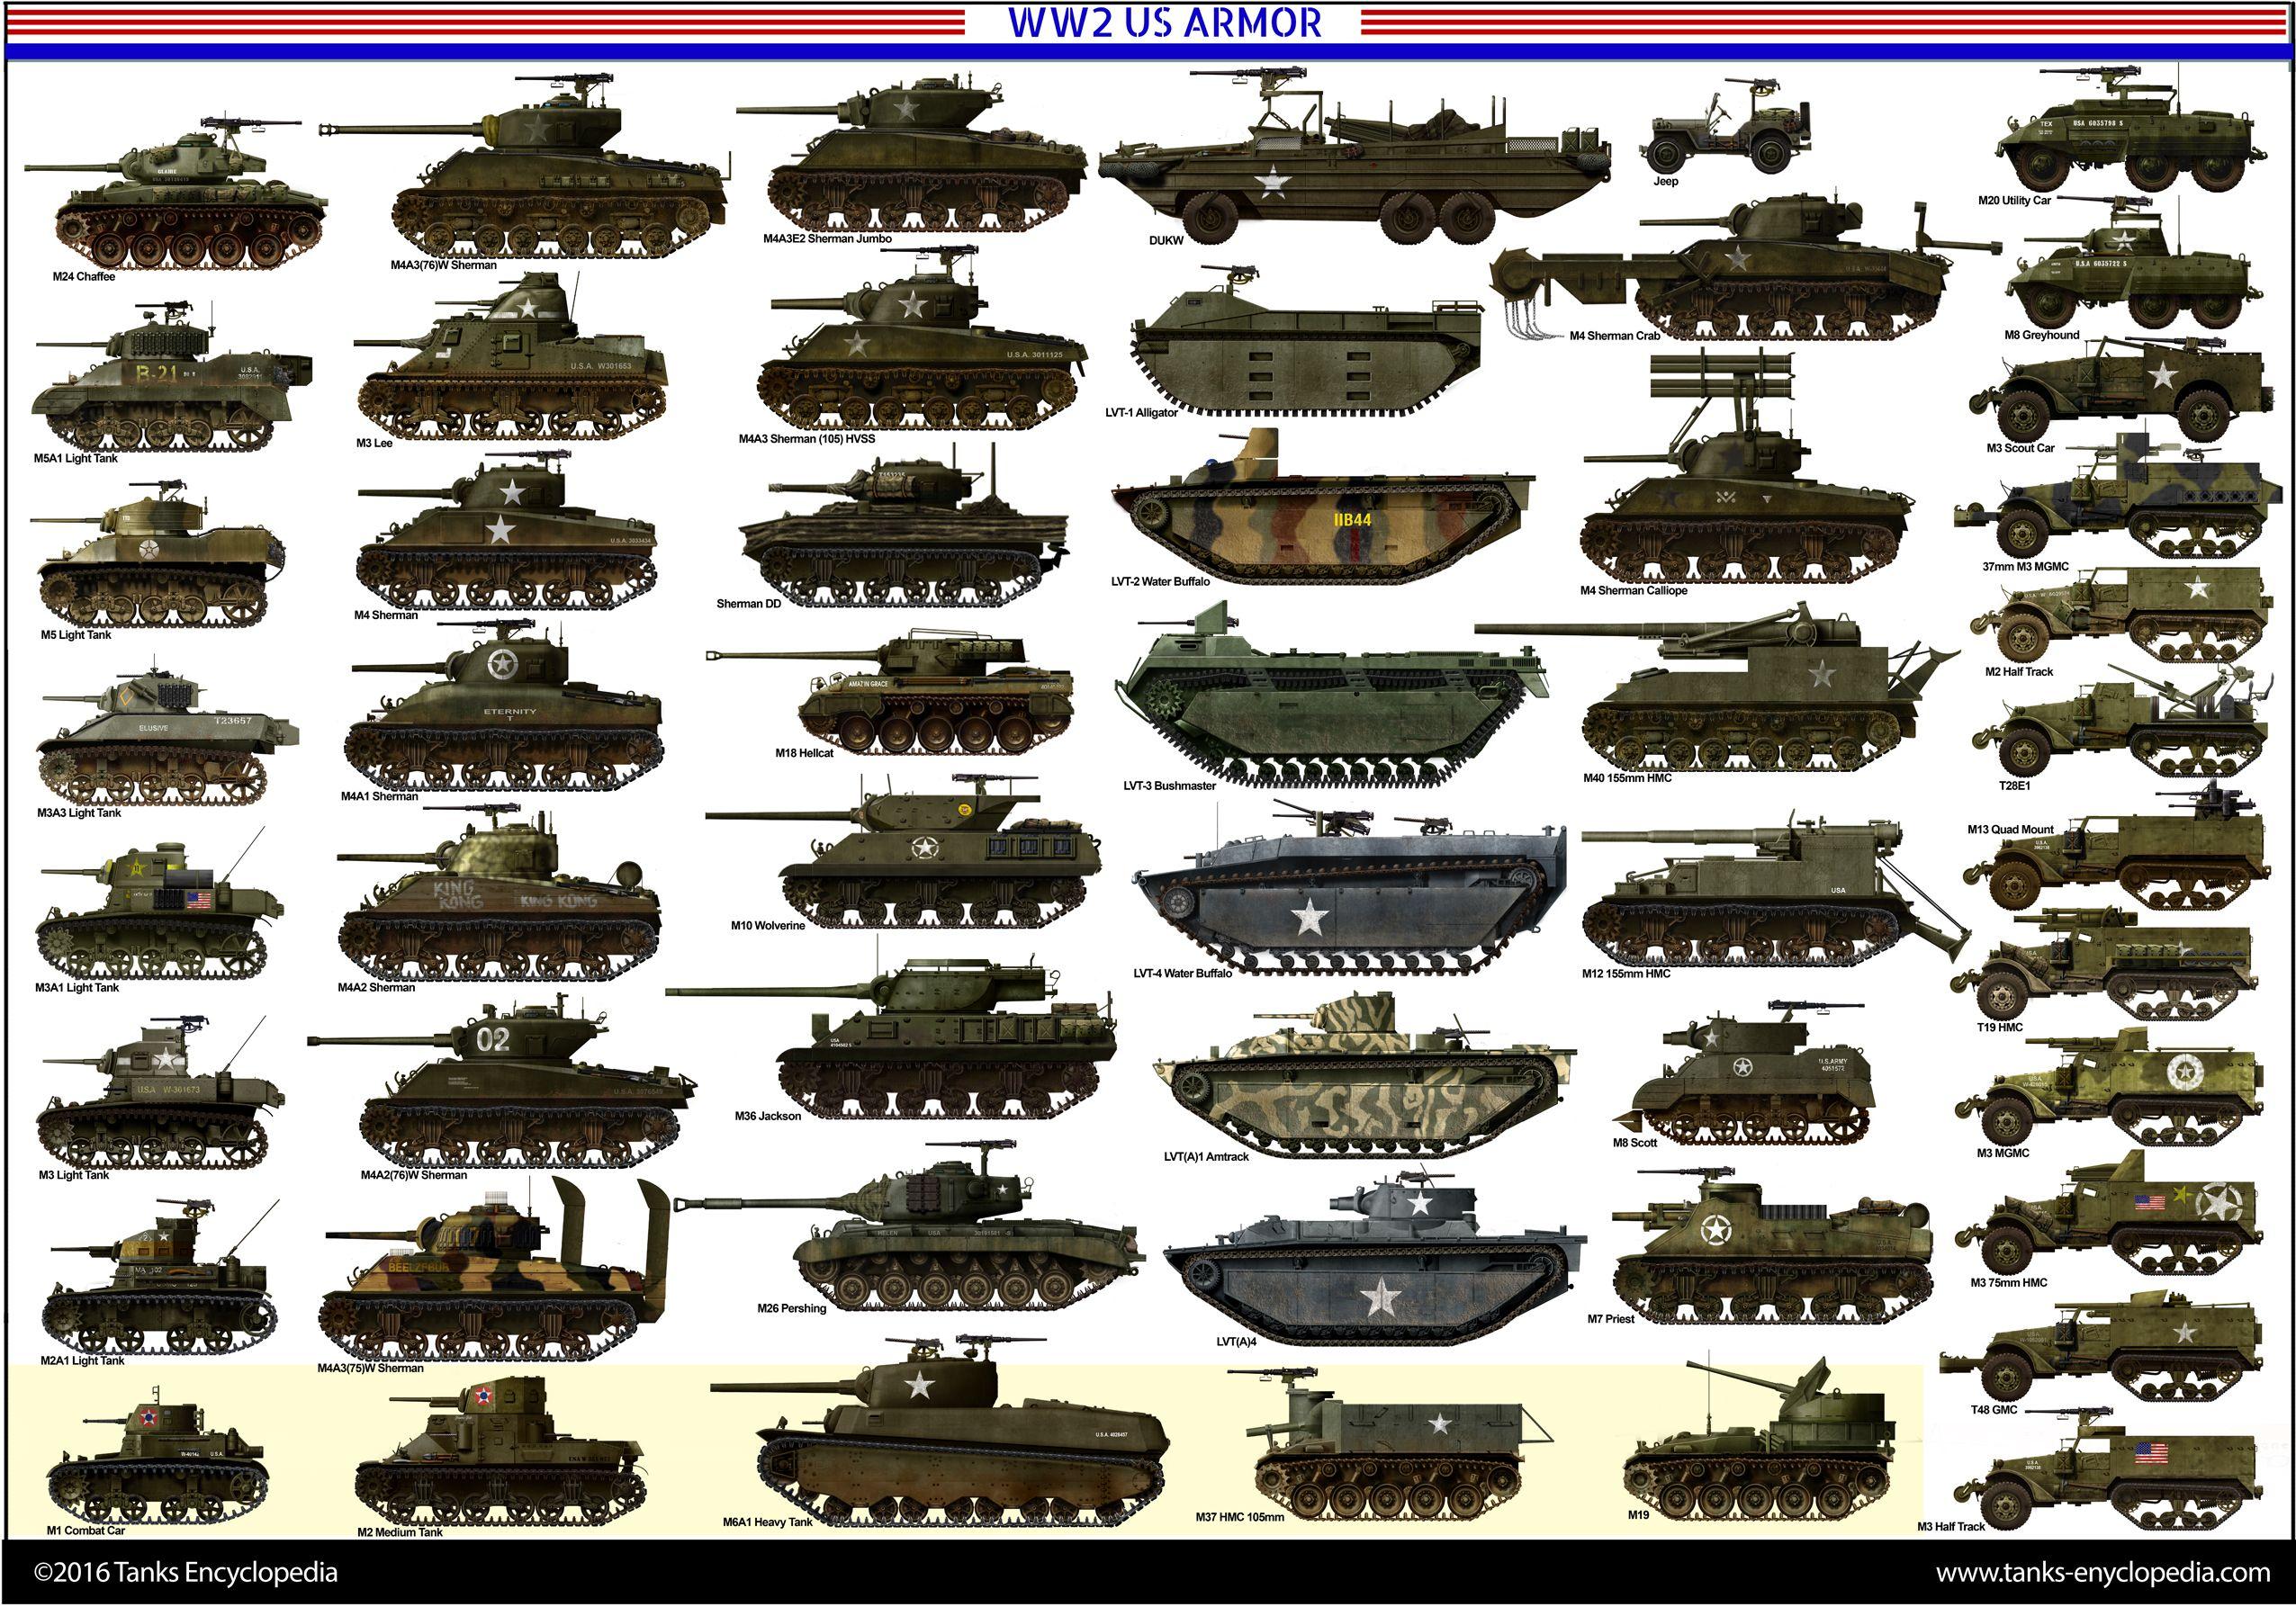 ww2 american armour model